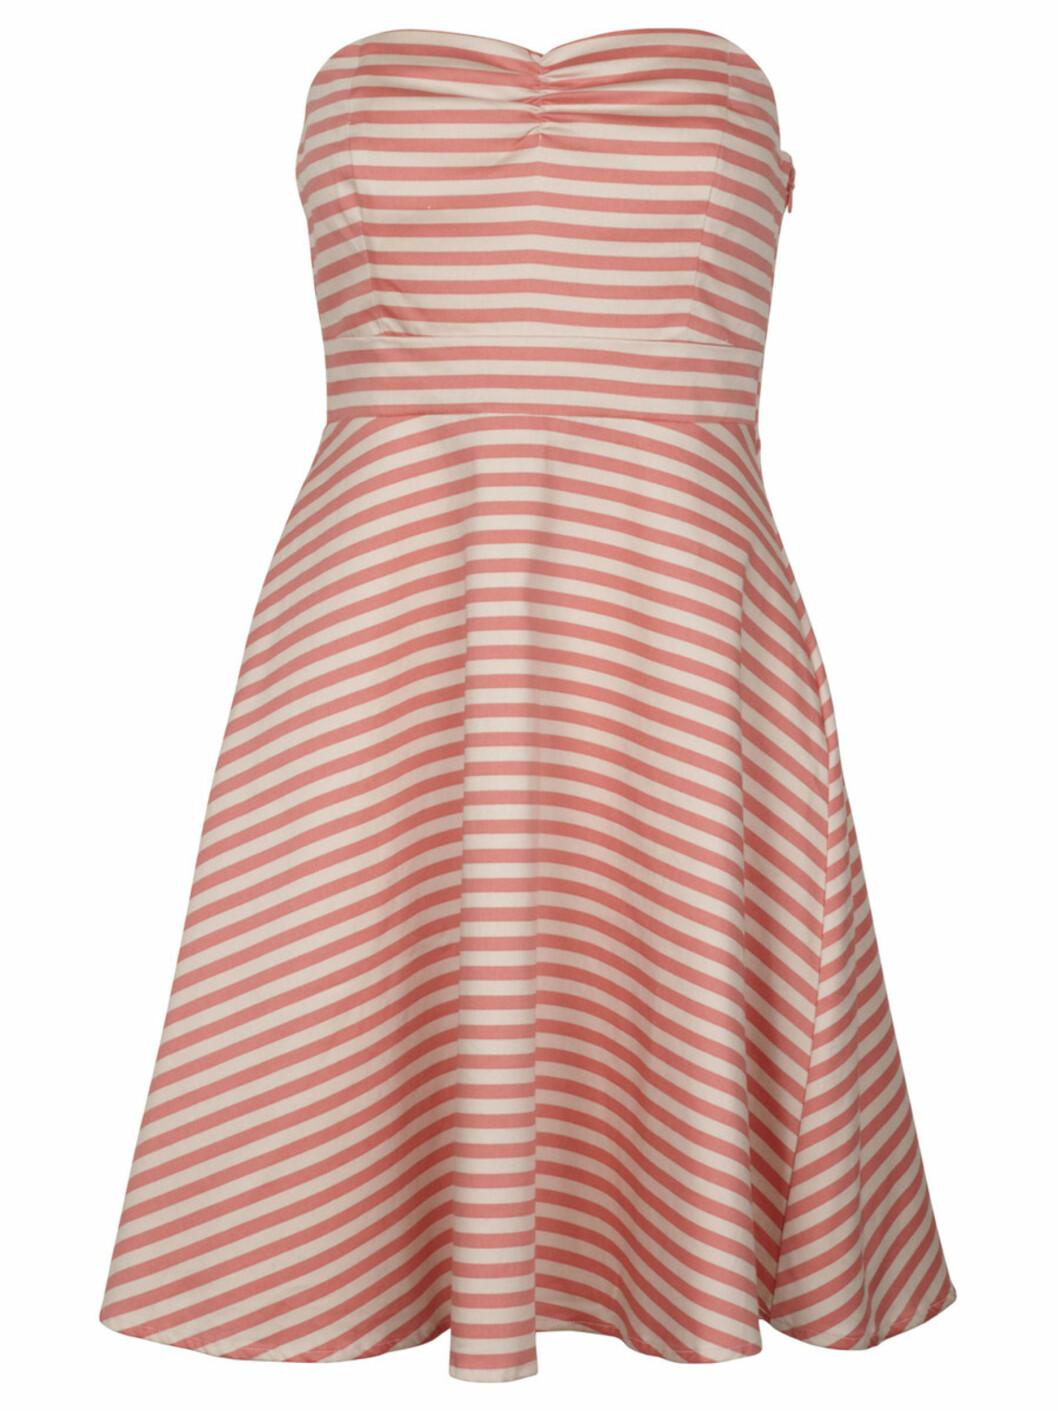 Stripete kjole (kr 400/Vila). Foto: Produsent